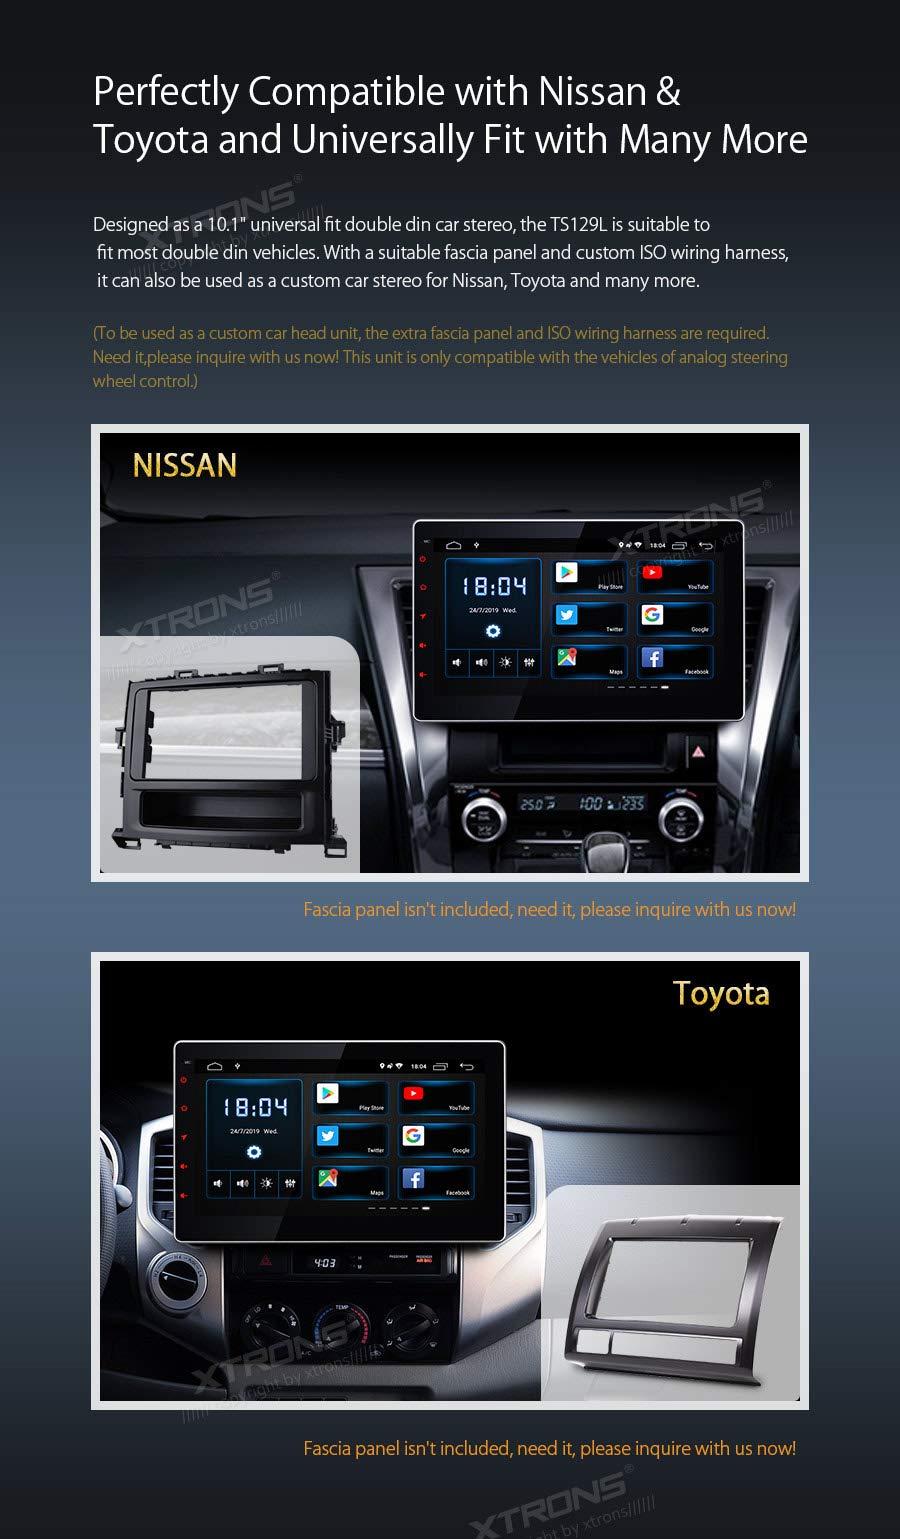 XTRONS-101-Android-Autoradio-mit-Touch-Screen-Double-Din-Mutimedia-Player-Autoradio-mit-Quad-Core-3G-4G-Bluetooth50-2Din-2GB-RAM-16GB-ROM-OBD2-Voll-RCA-Ausgang-UNIVERSAL